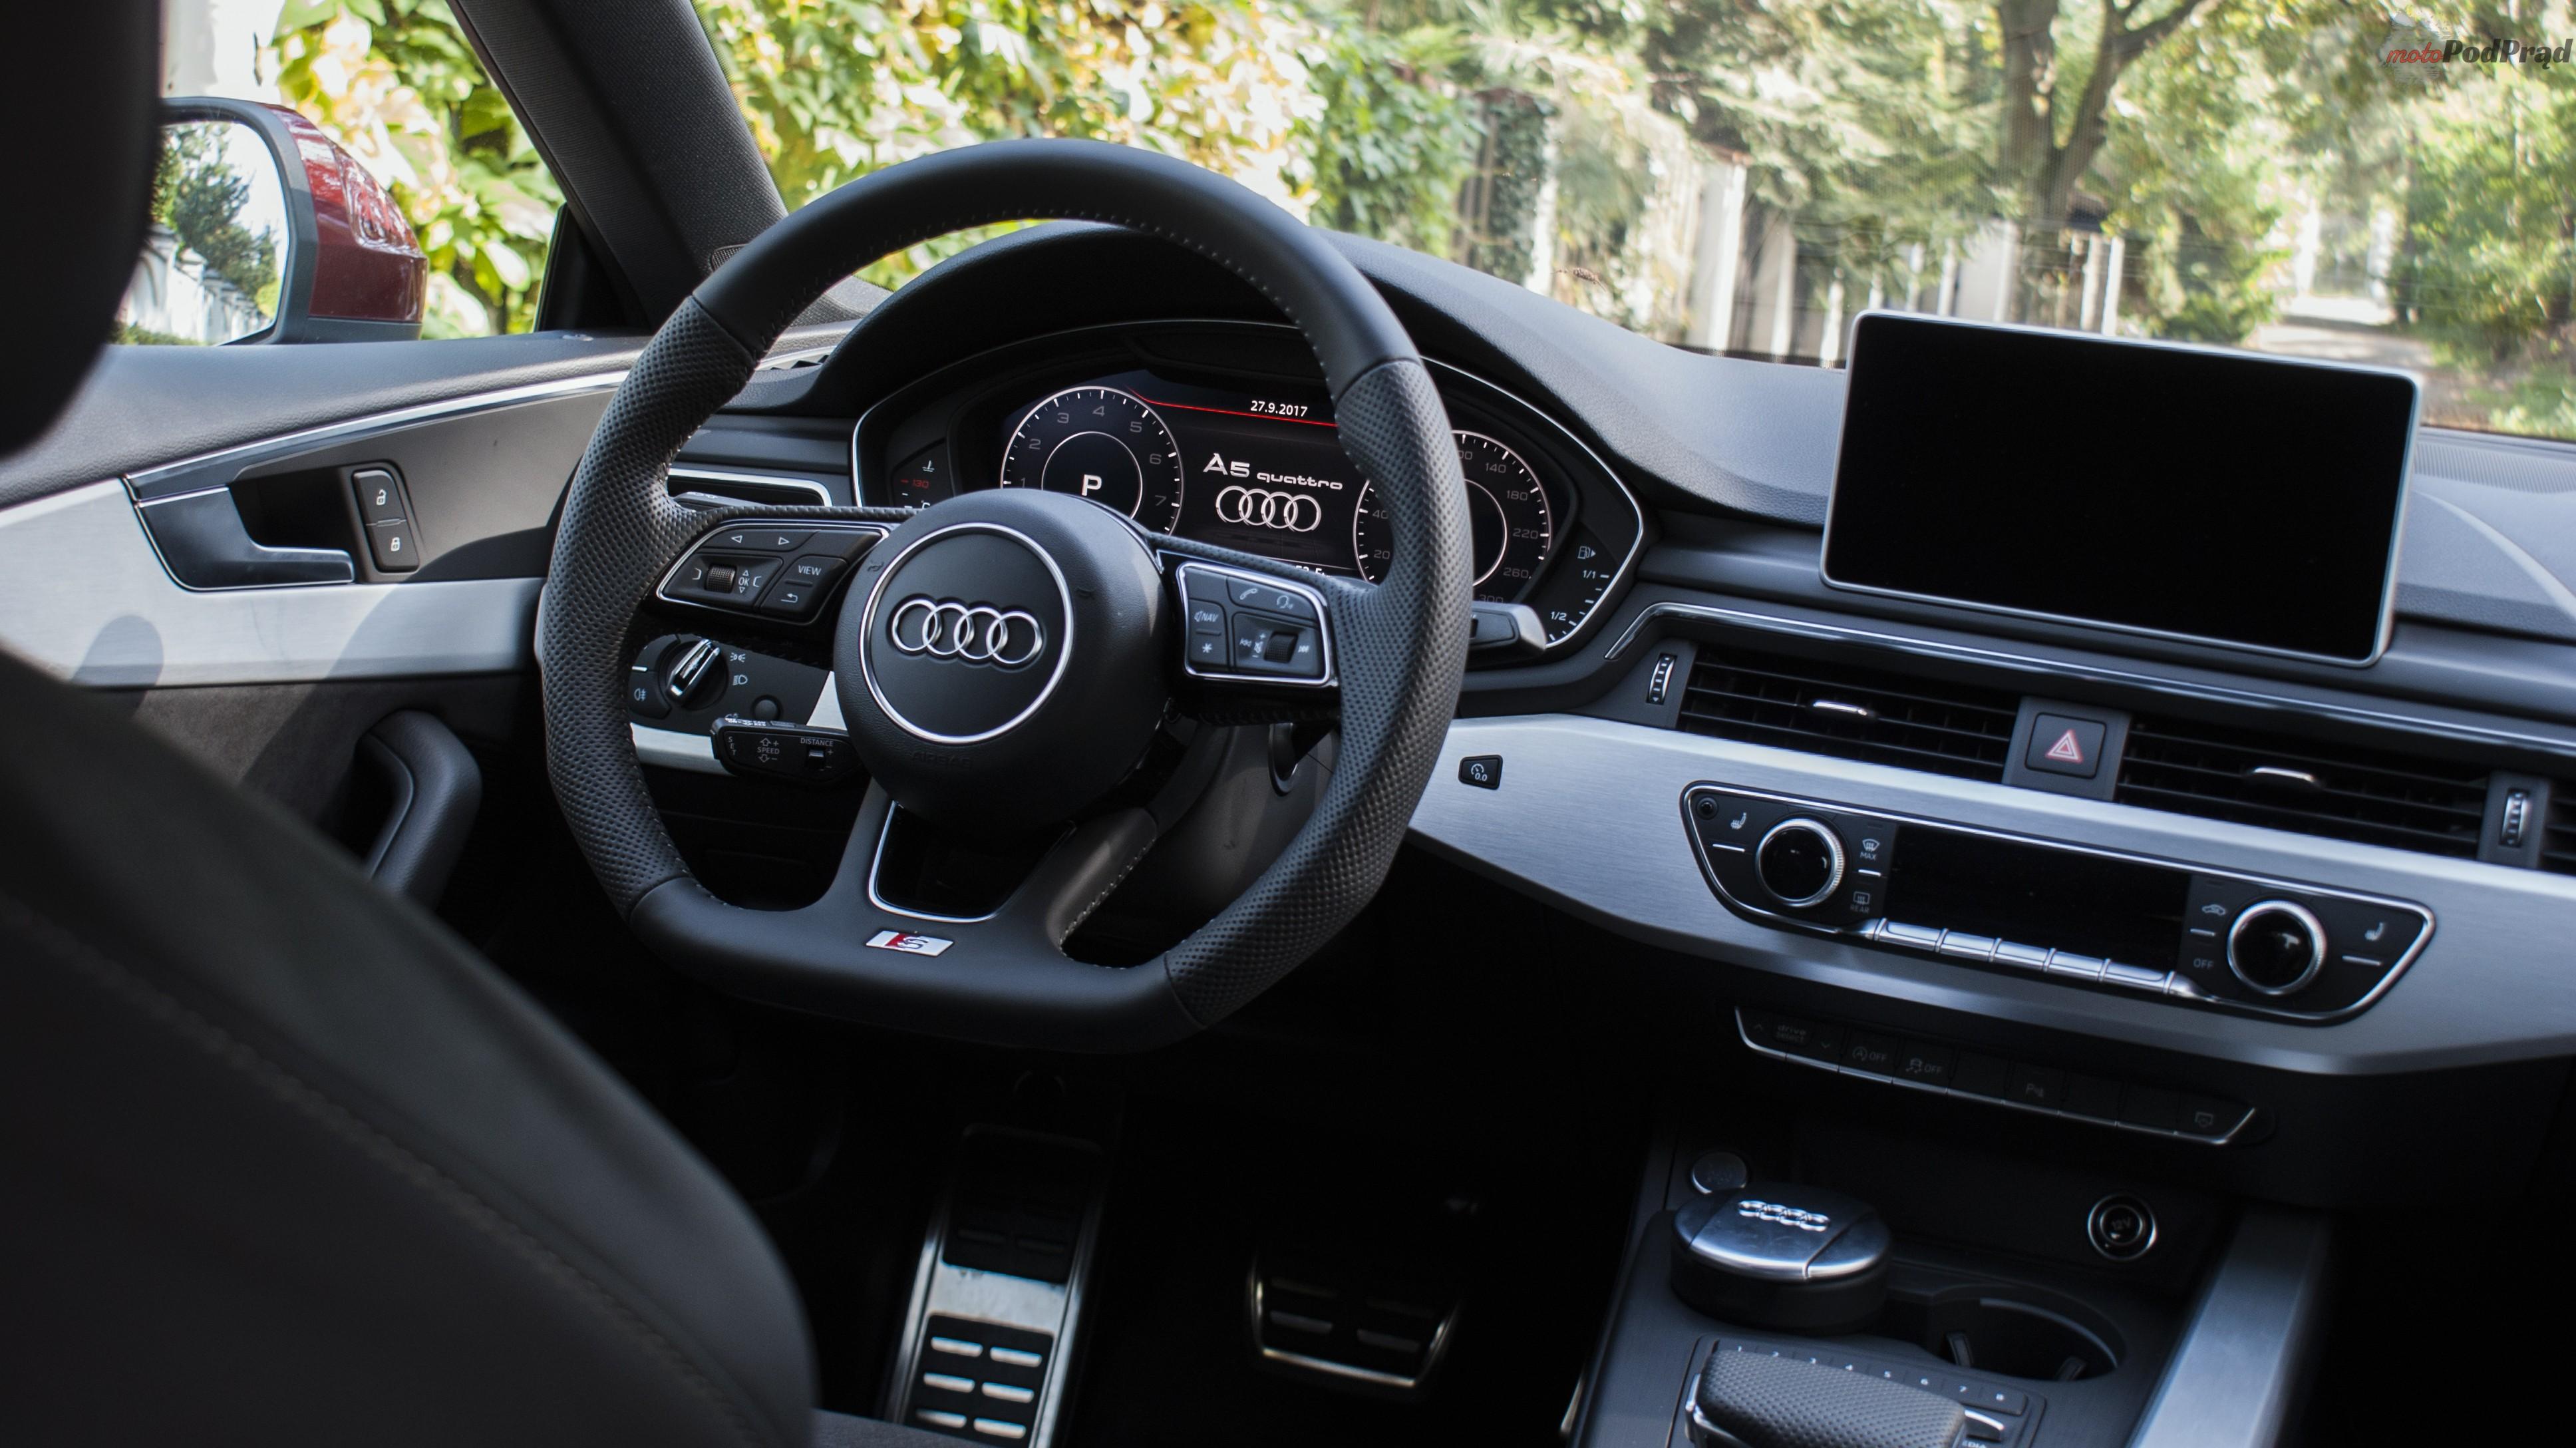 DSC01872 Test: Audi A5 Sportback 2.0 TFSI Quattro   Kwestia opakowania.